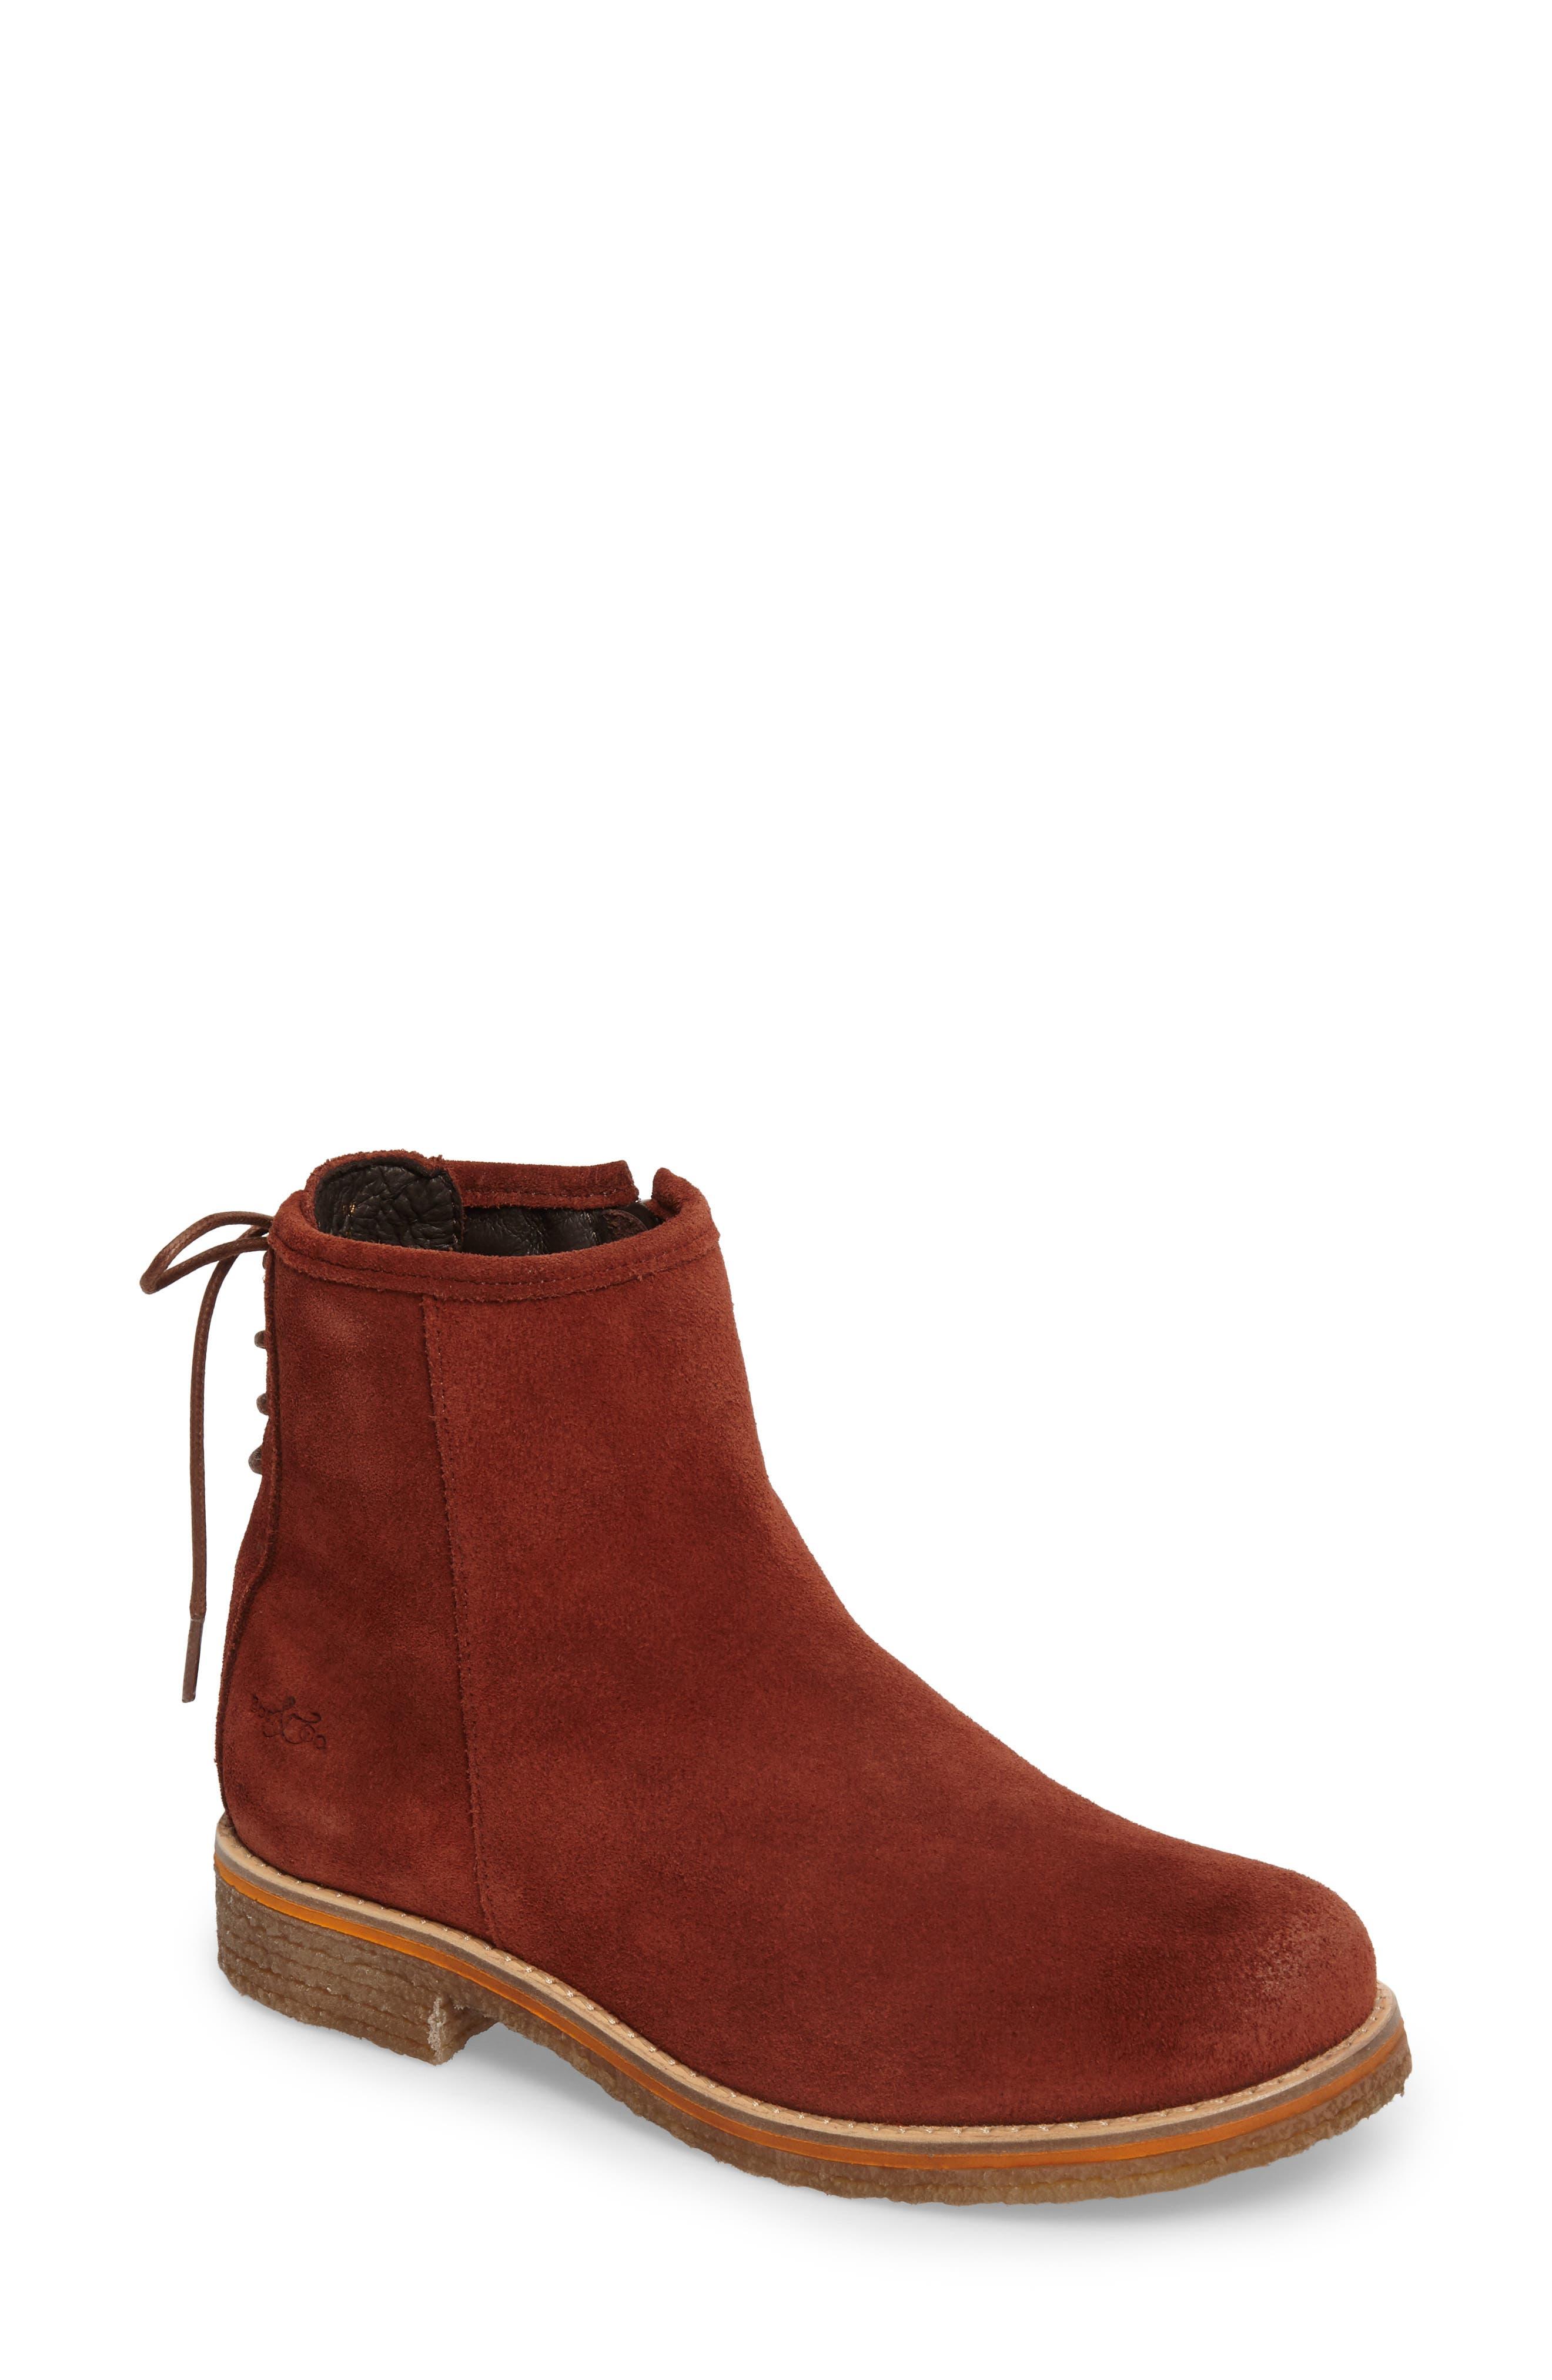 Bay Waterproof Boot,                         Main,                         color, Brick Suede